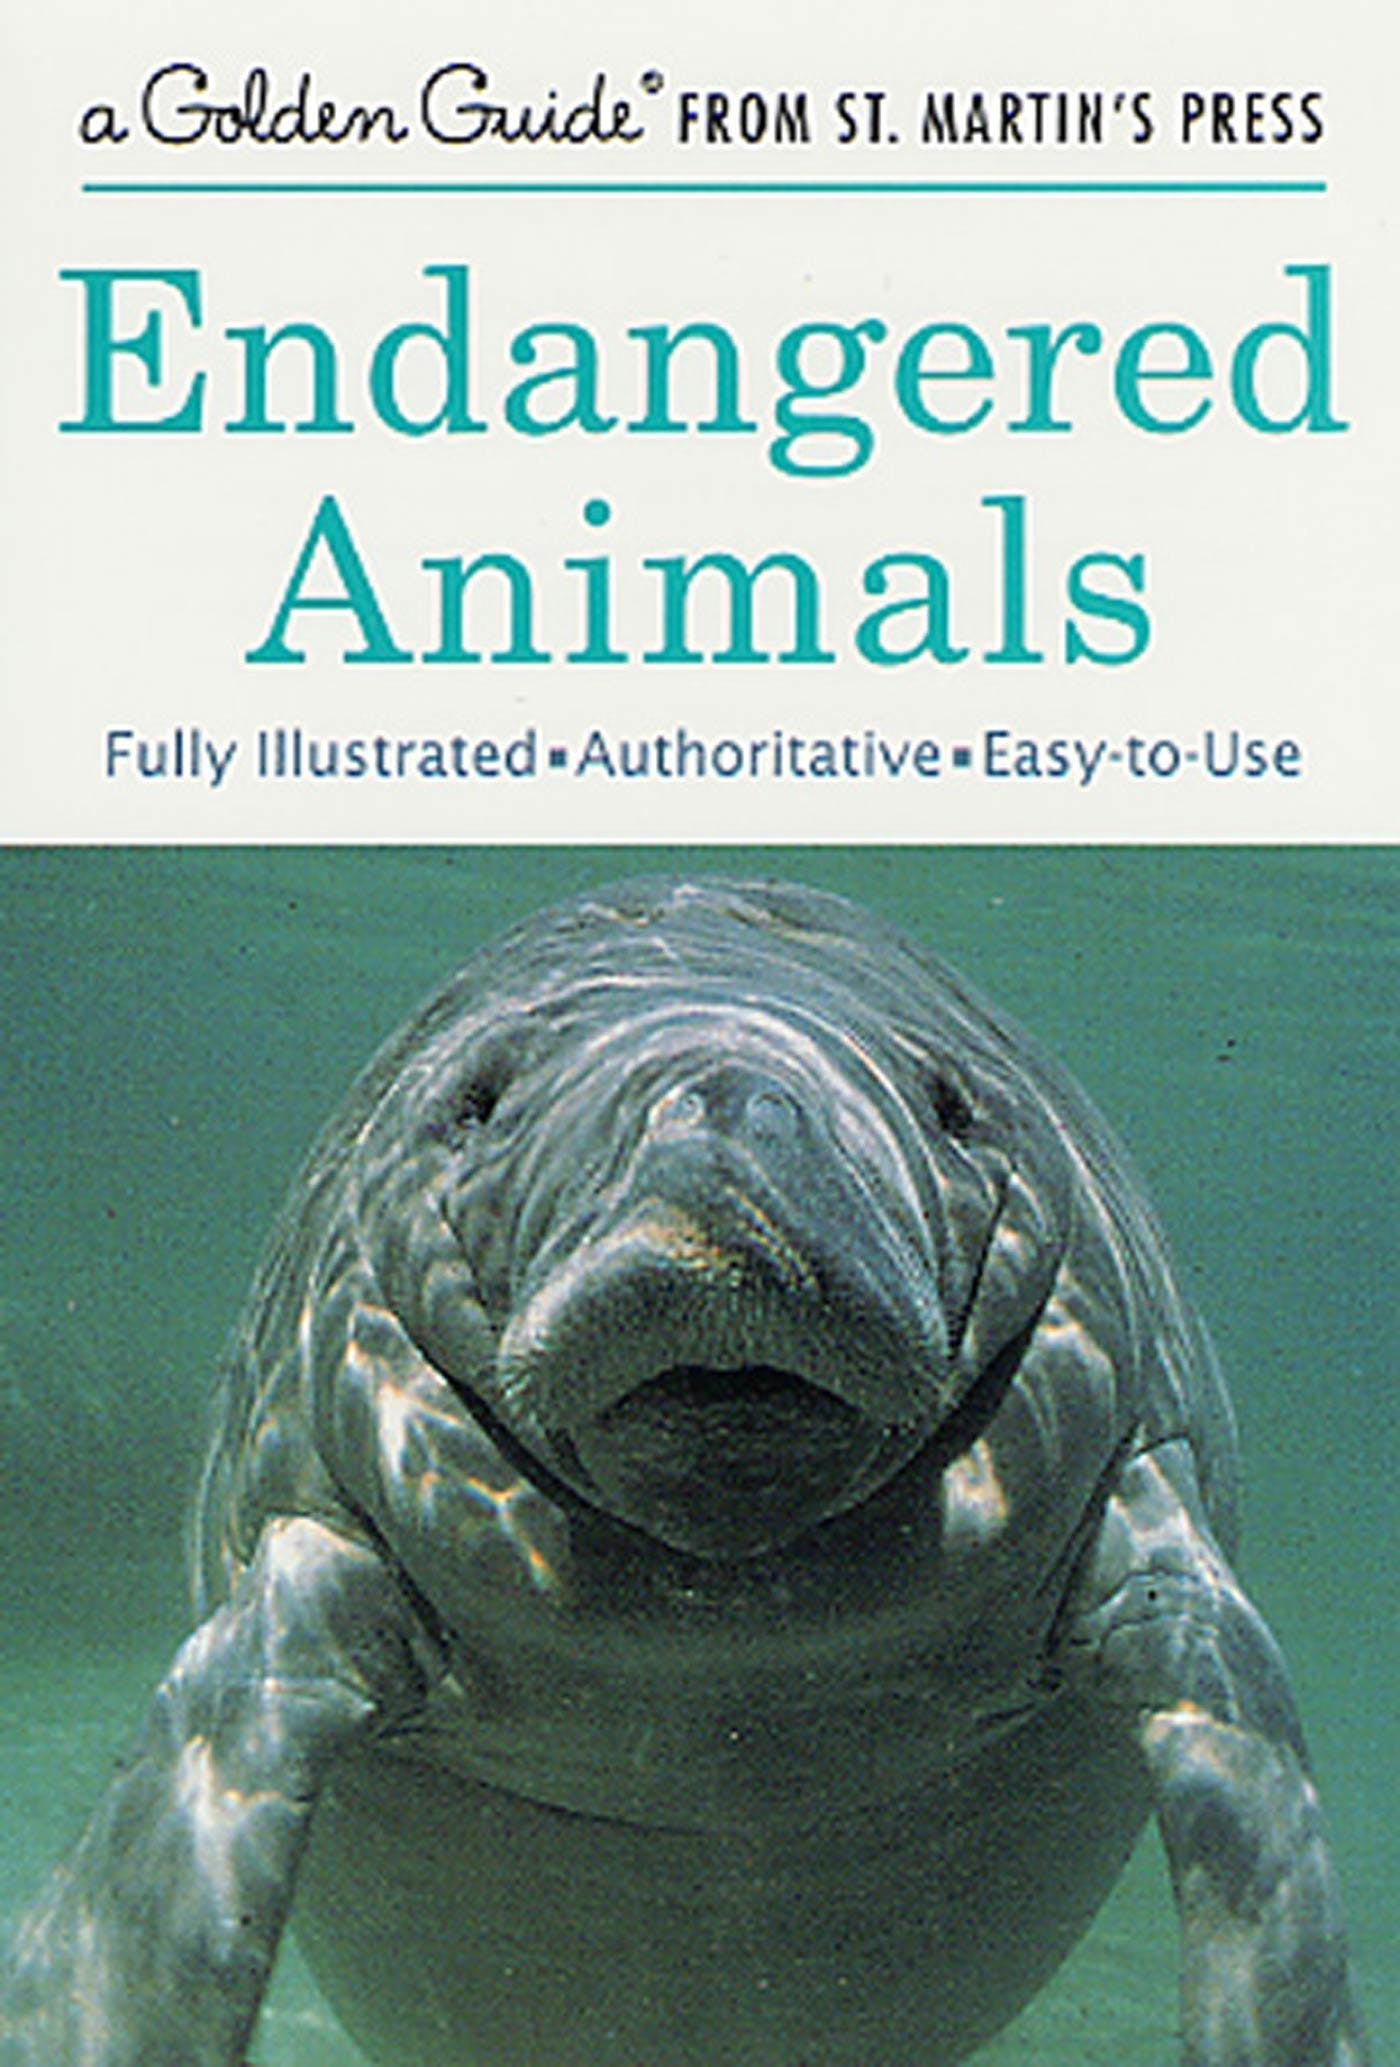 Image of Endangered Animals